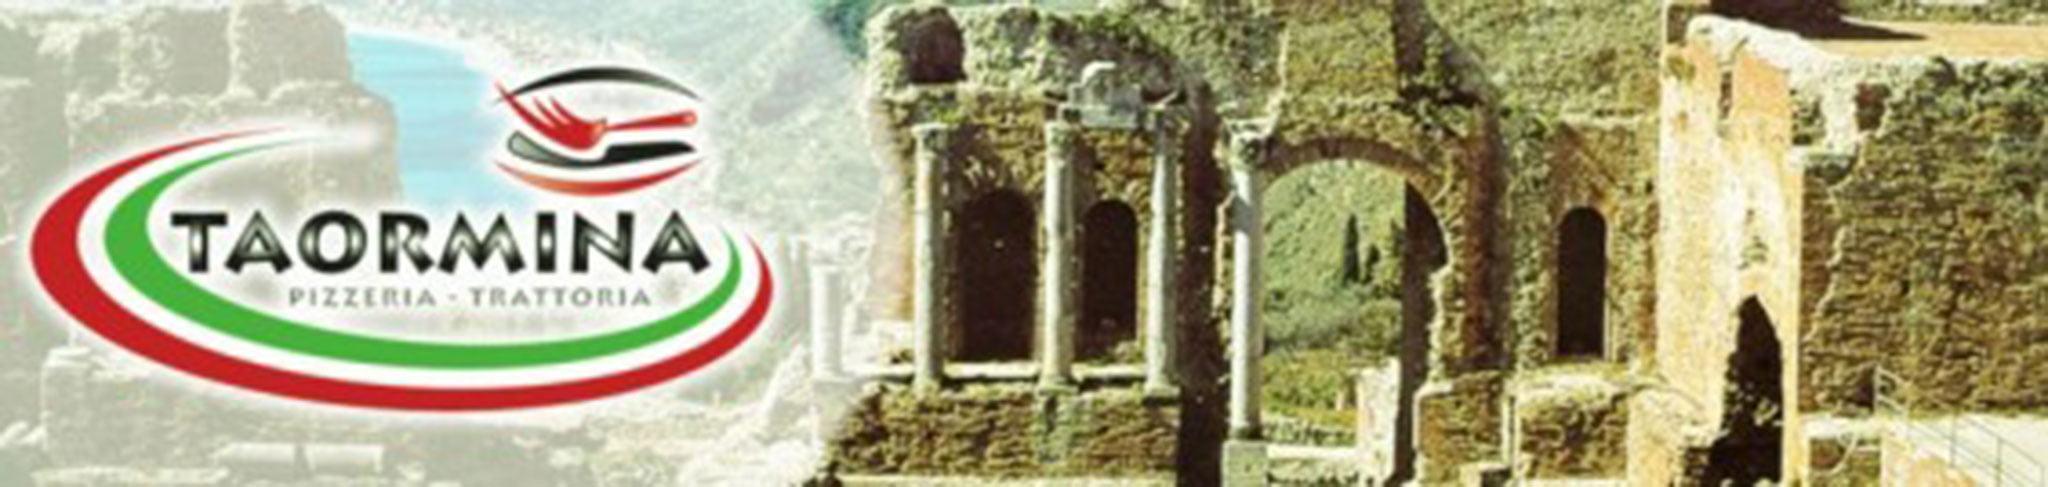 Logotipo de Taormina